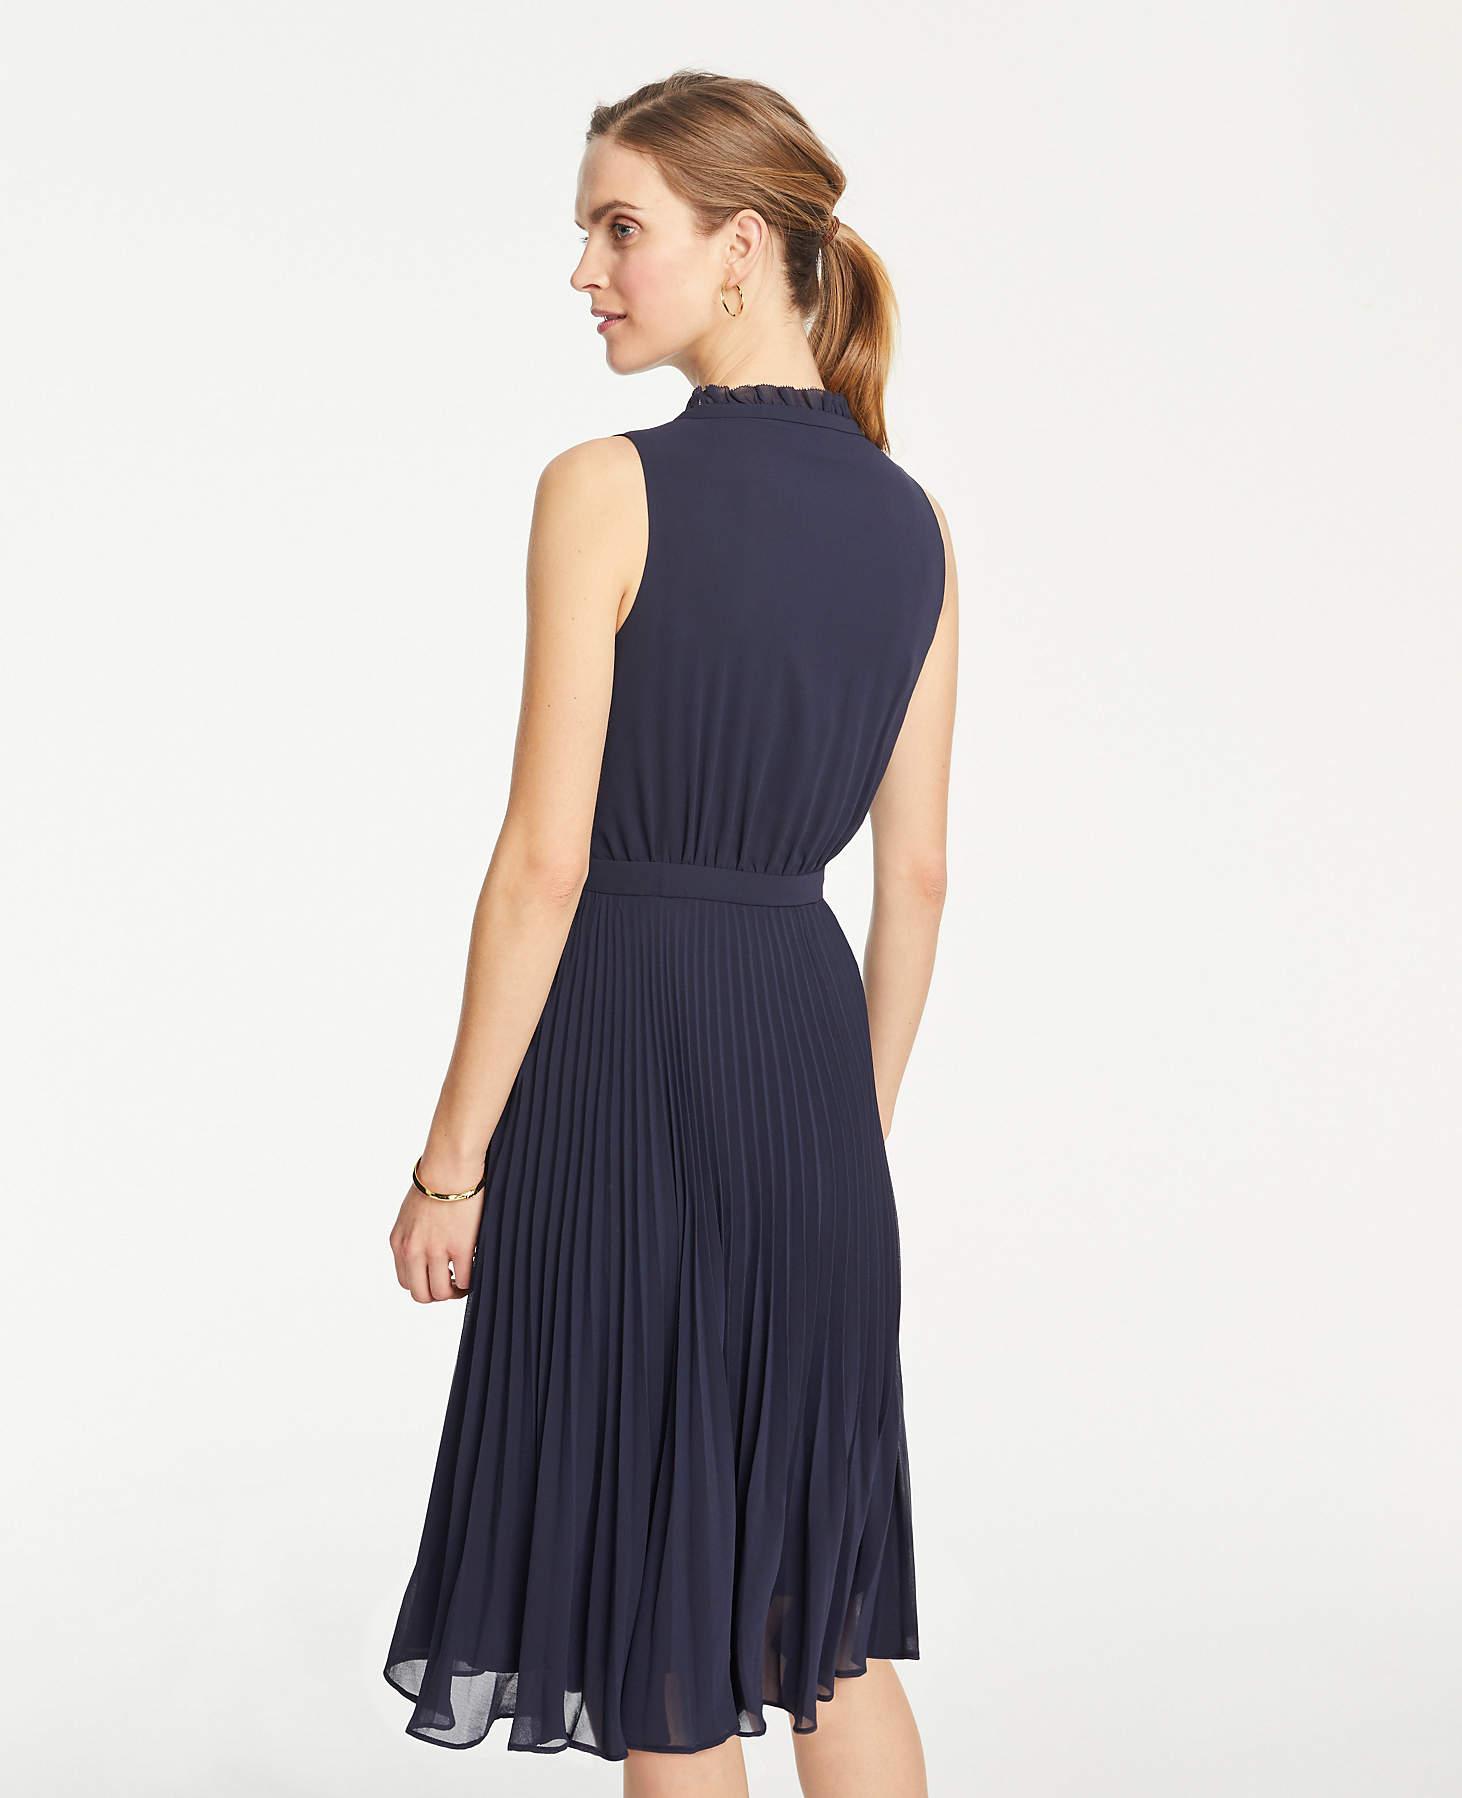 6e9938abfbee8d Lyst - Ann Taylor Petite Ruffle Pleated Flare Dress in Blue